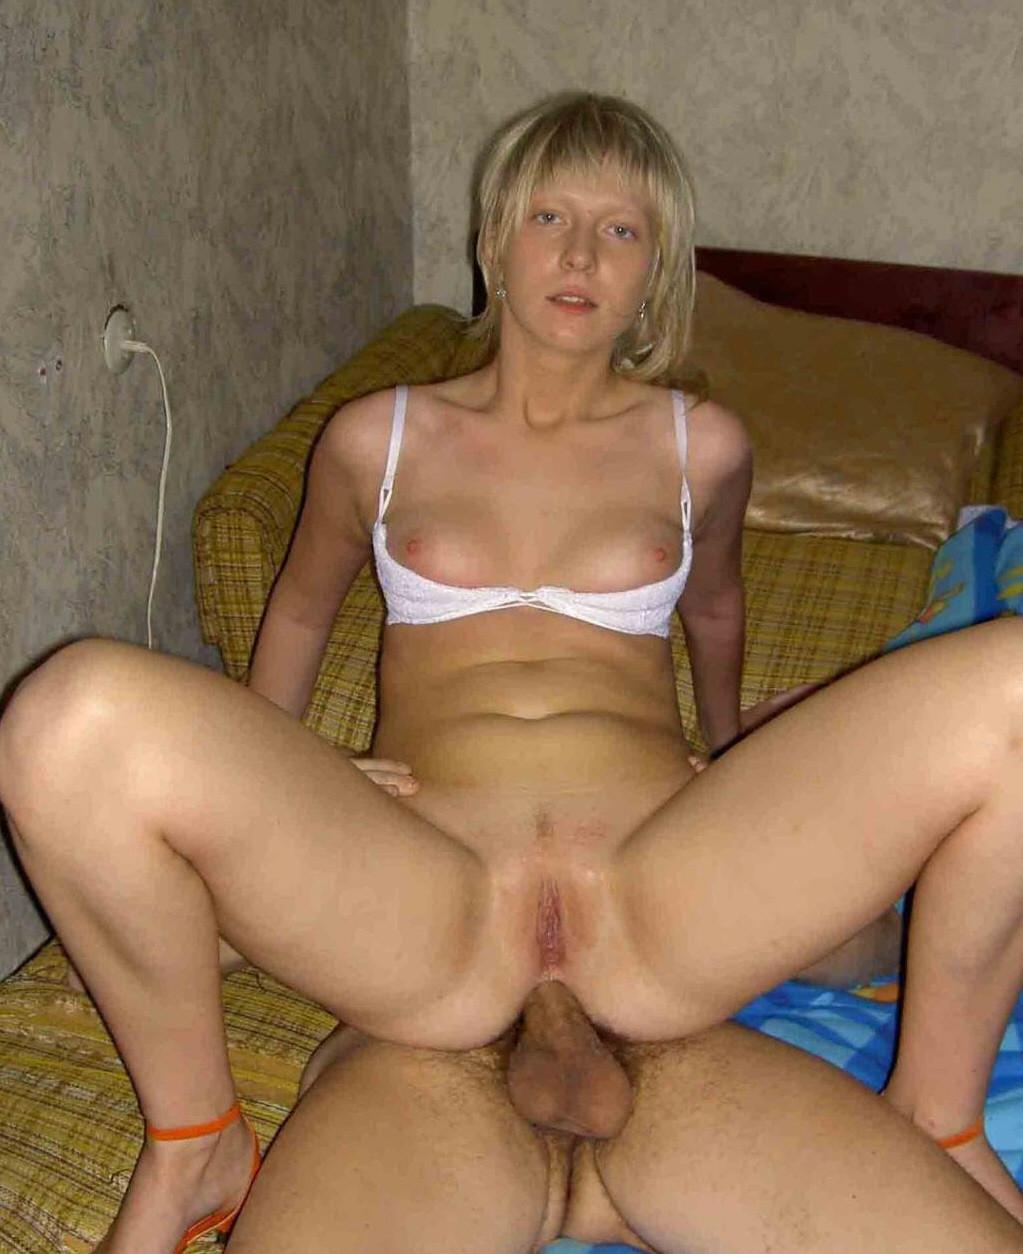 Зрелая Жена Хочет Секса